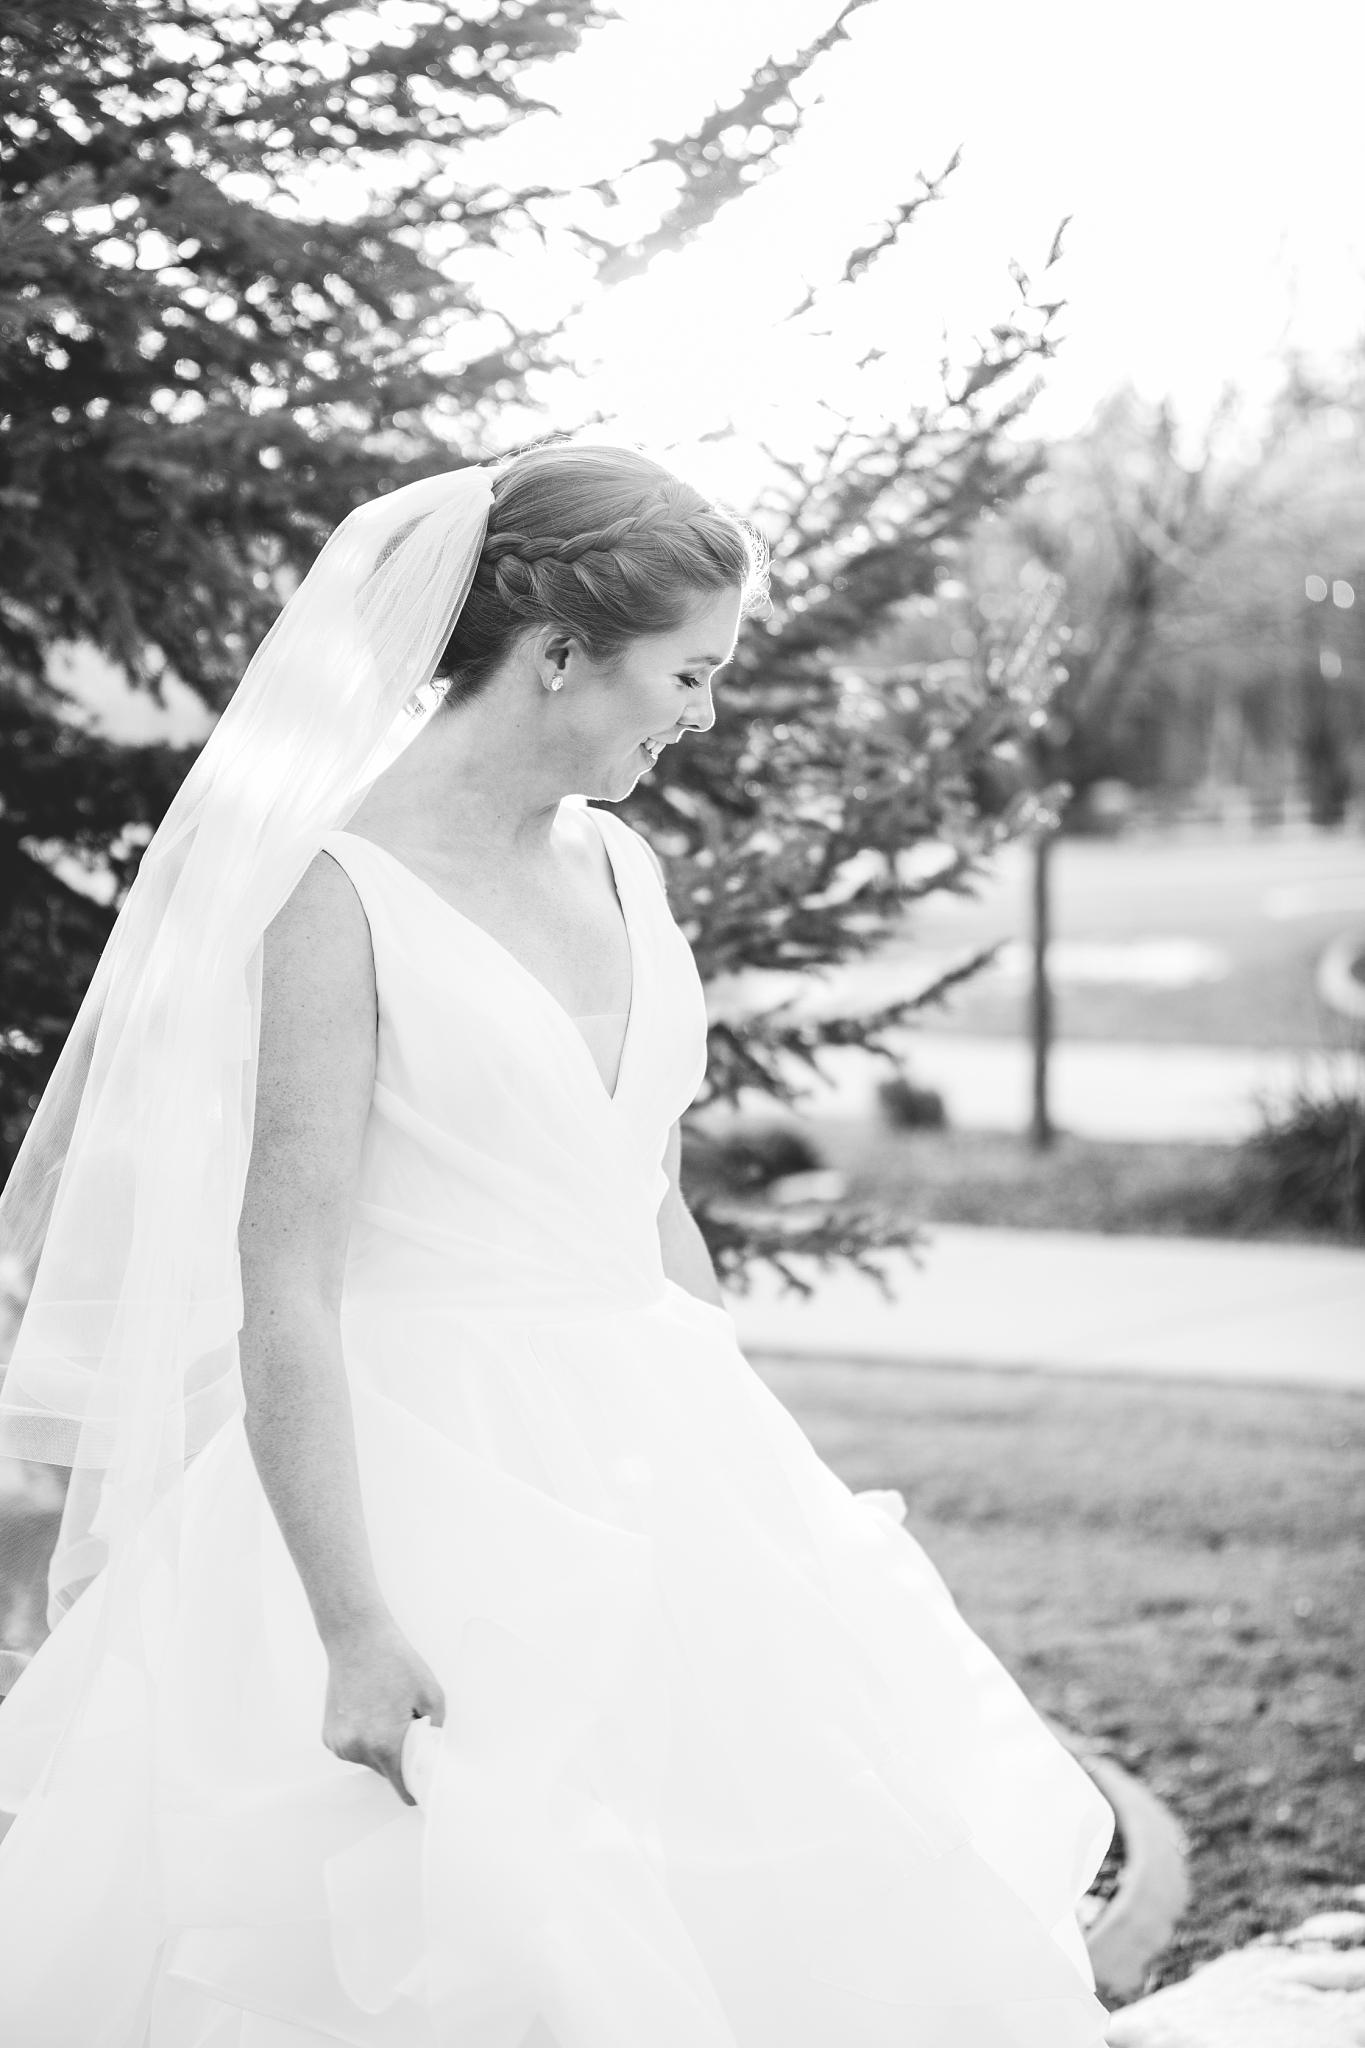 CN-Wedding-245-BW_Lizzie-B-Imagery-Utah-Wedding-Photographer-Blessed-Sacrament-Catholic-Church-Sandy-Utah-The-Blended-Table-Salt-Lake-City.jpg